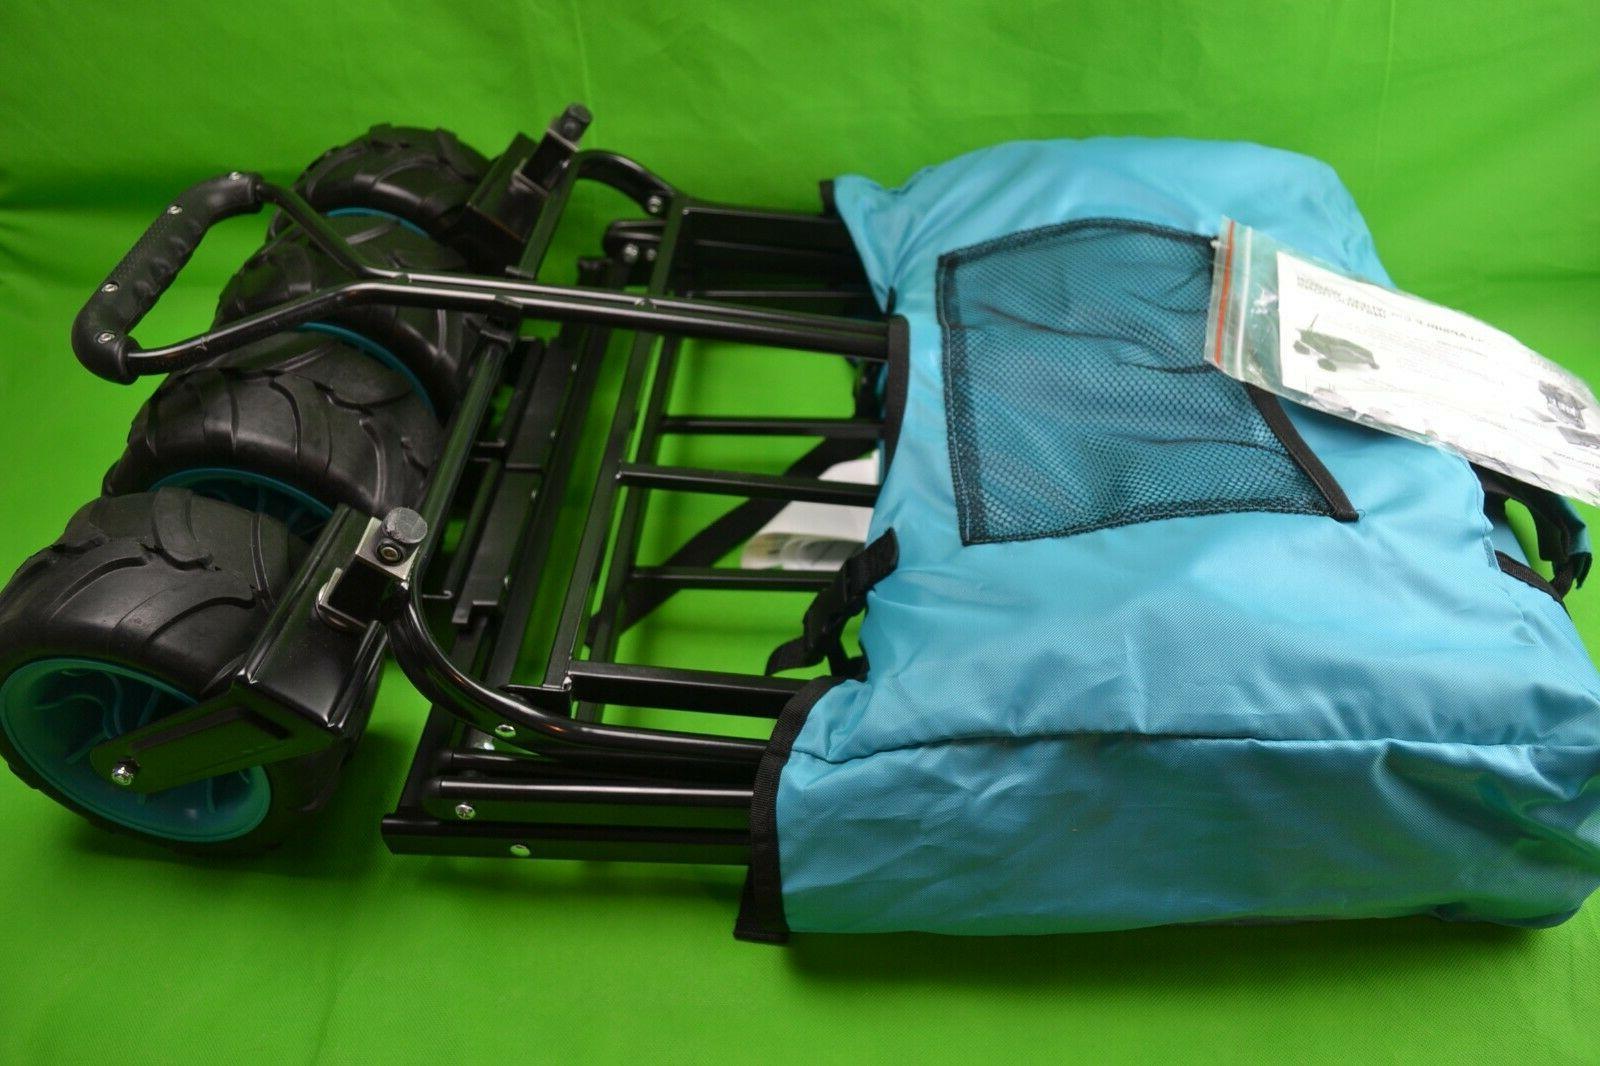 collapsible folding all terrain wagon 150 pound